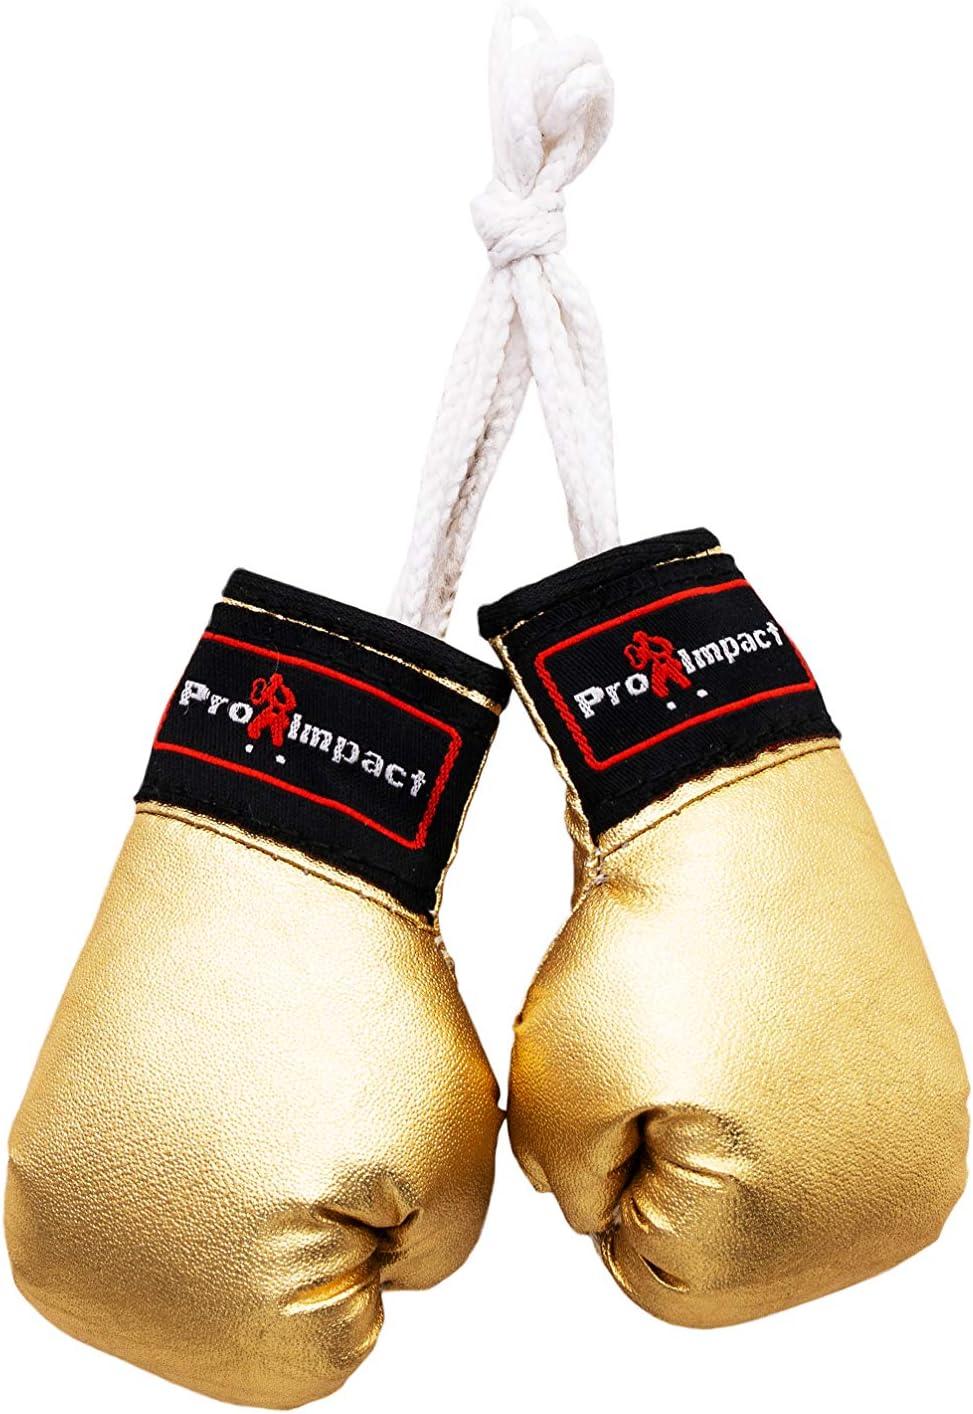 Amazon.com: Pro Impact Mini guantes de boxeo – Guantes de ...